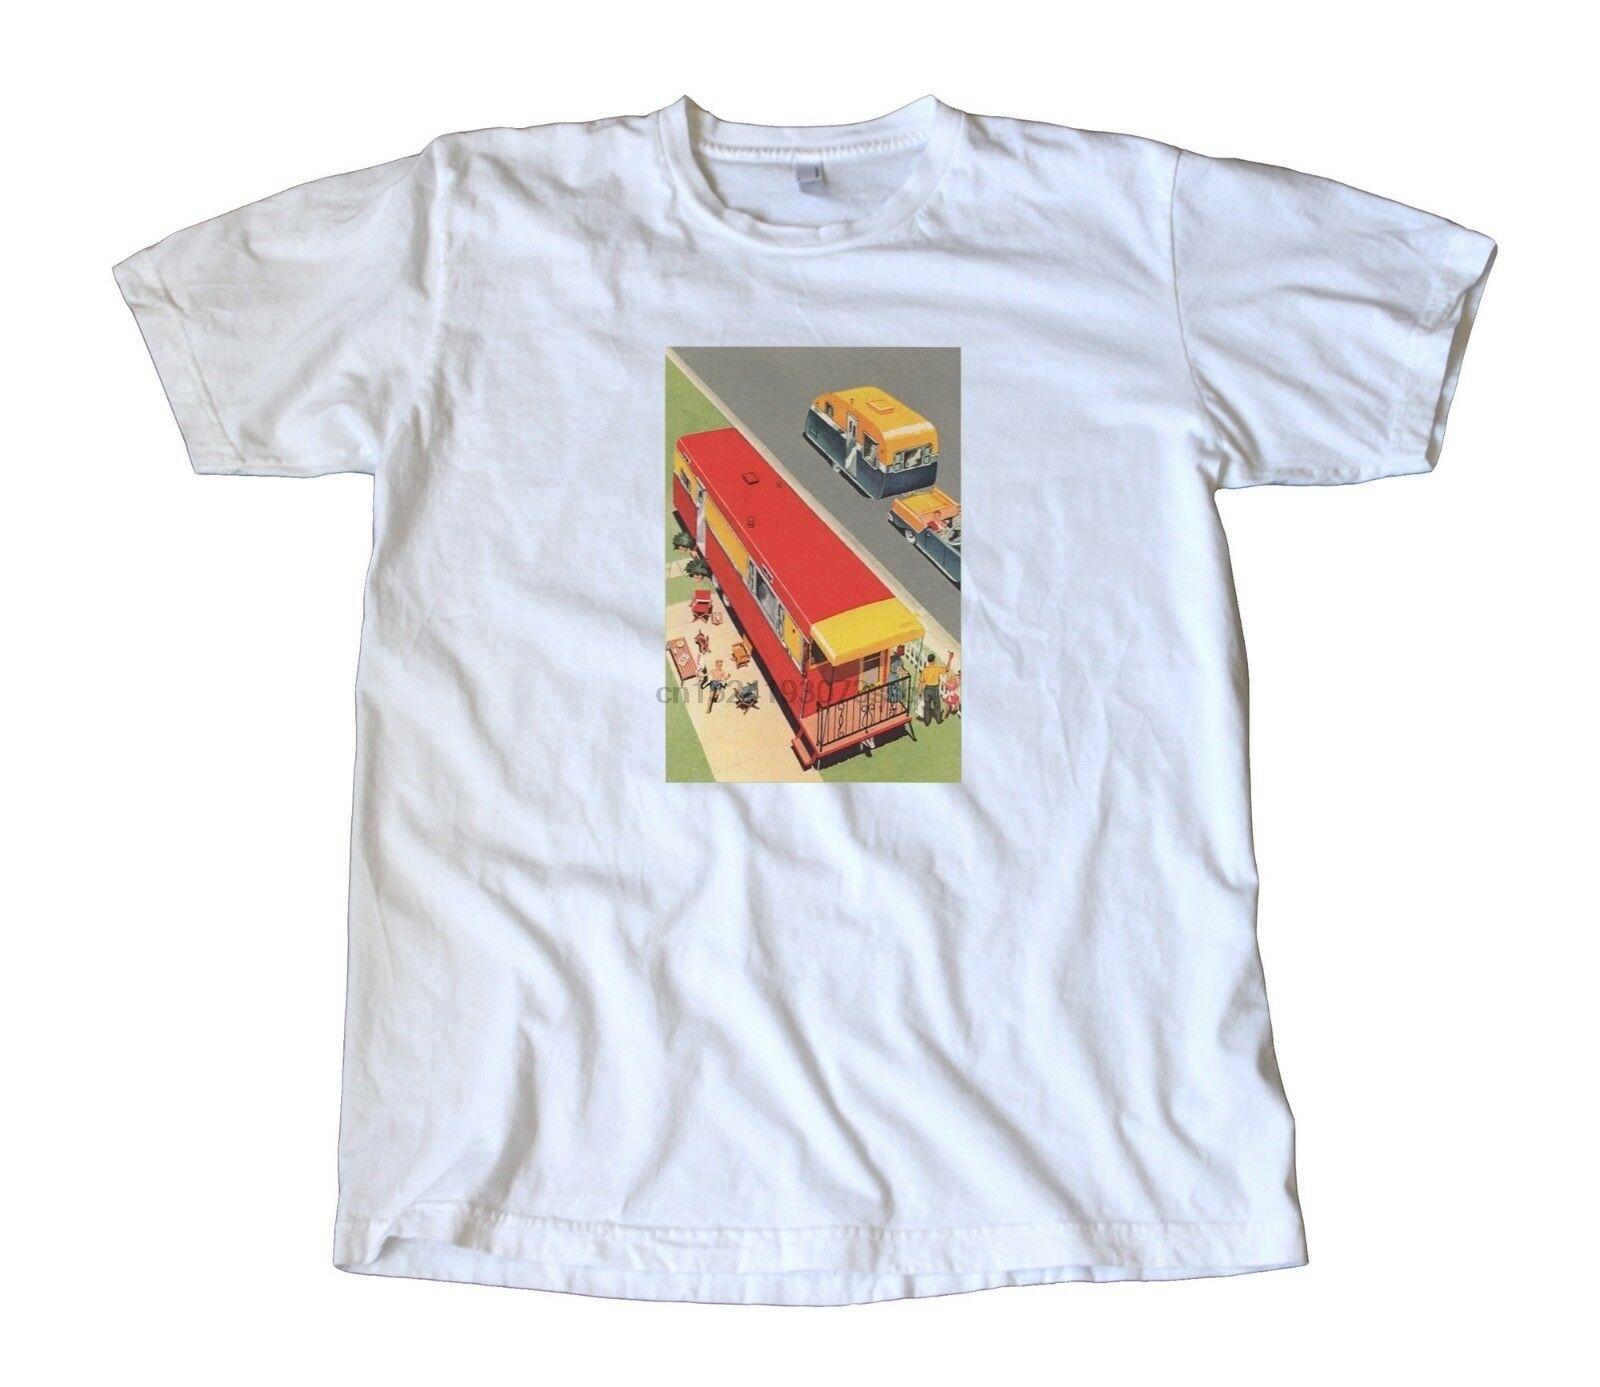 T-Shirt z naklejkami w stylu Vintage-Airstream Shasta Spartan piknik BBQ RV